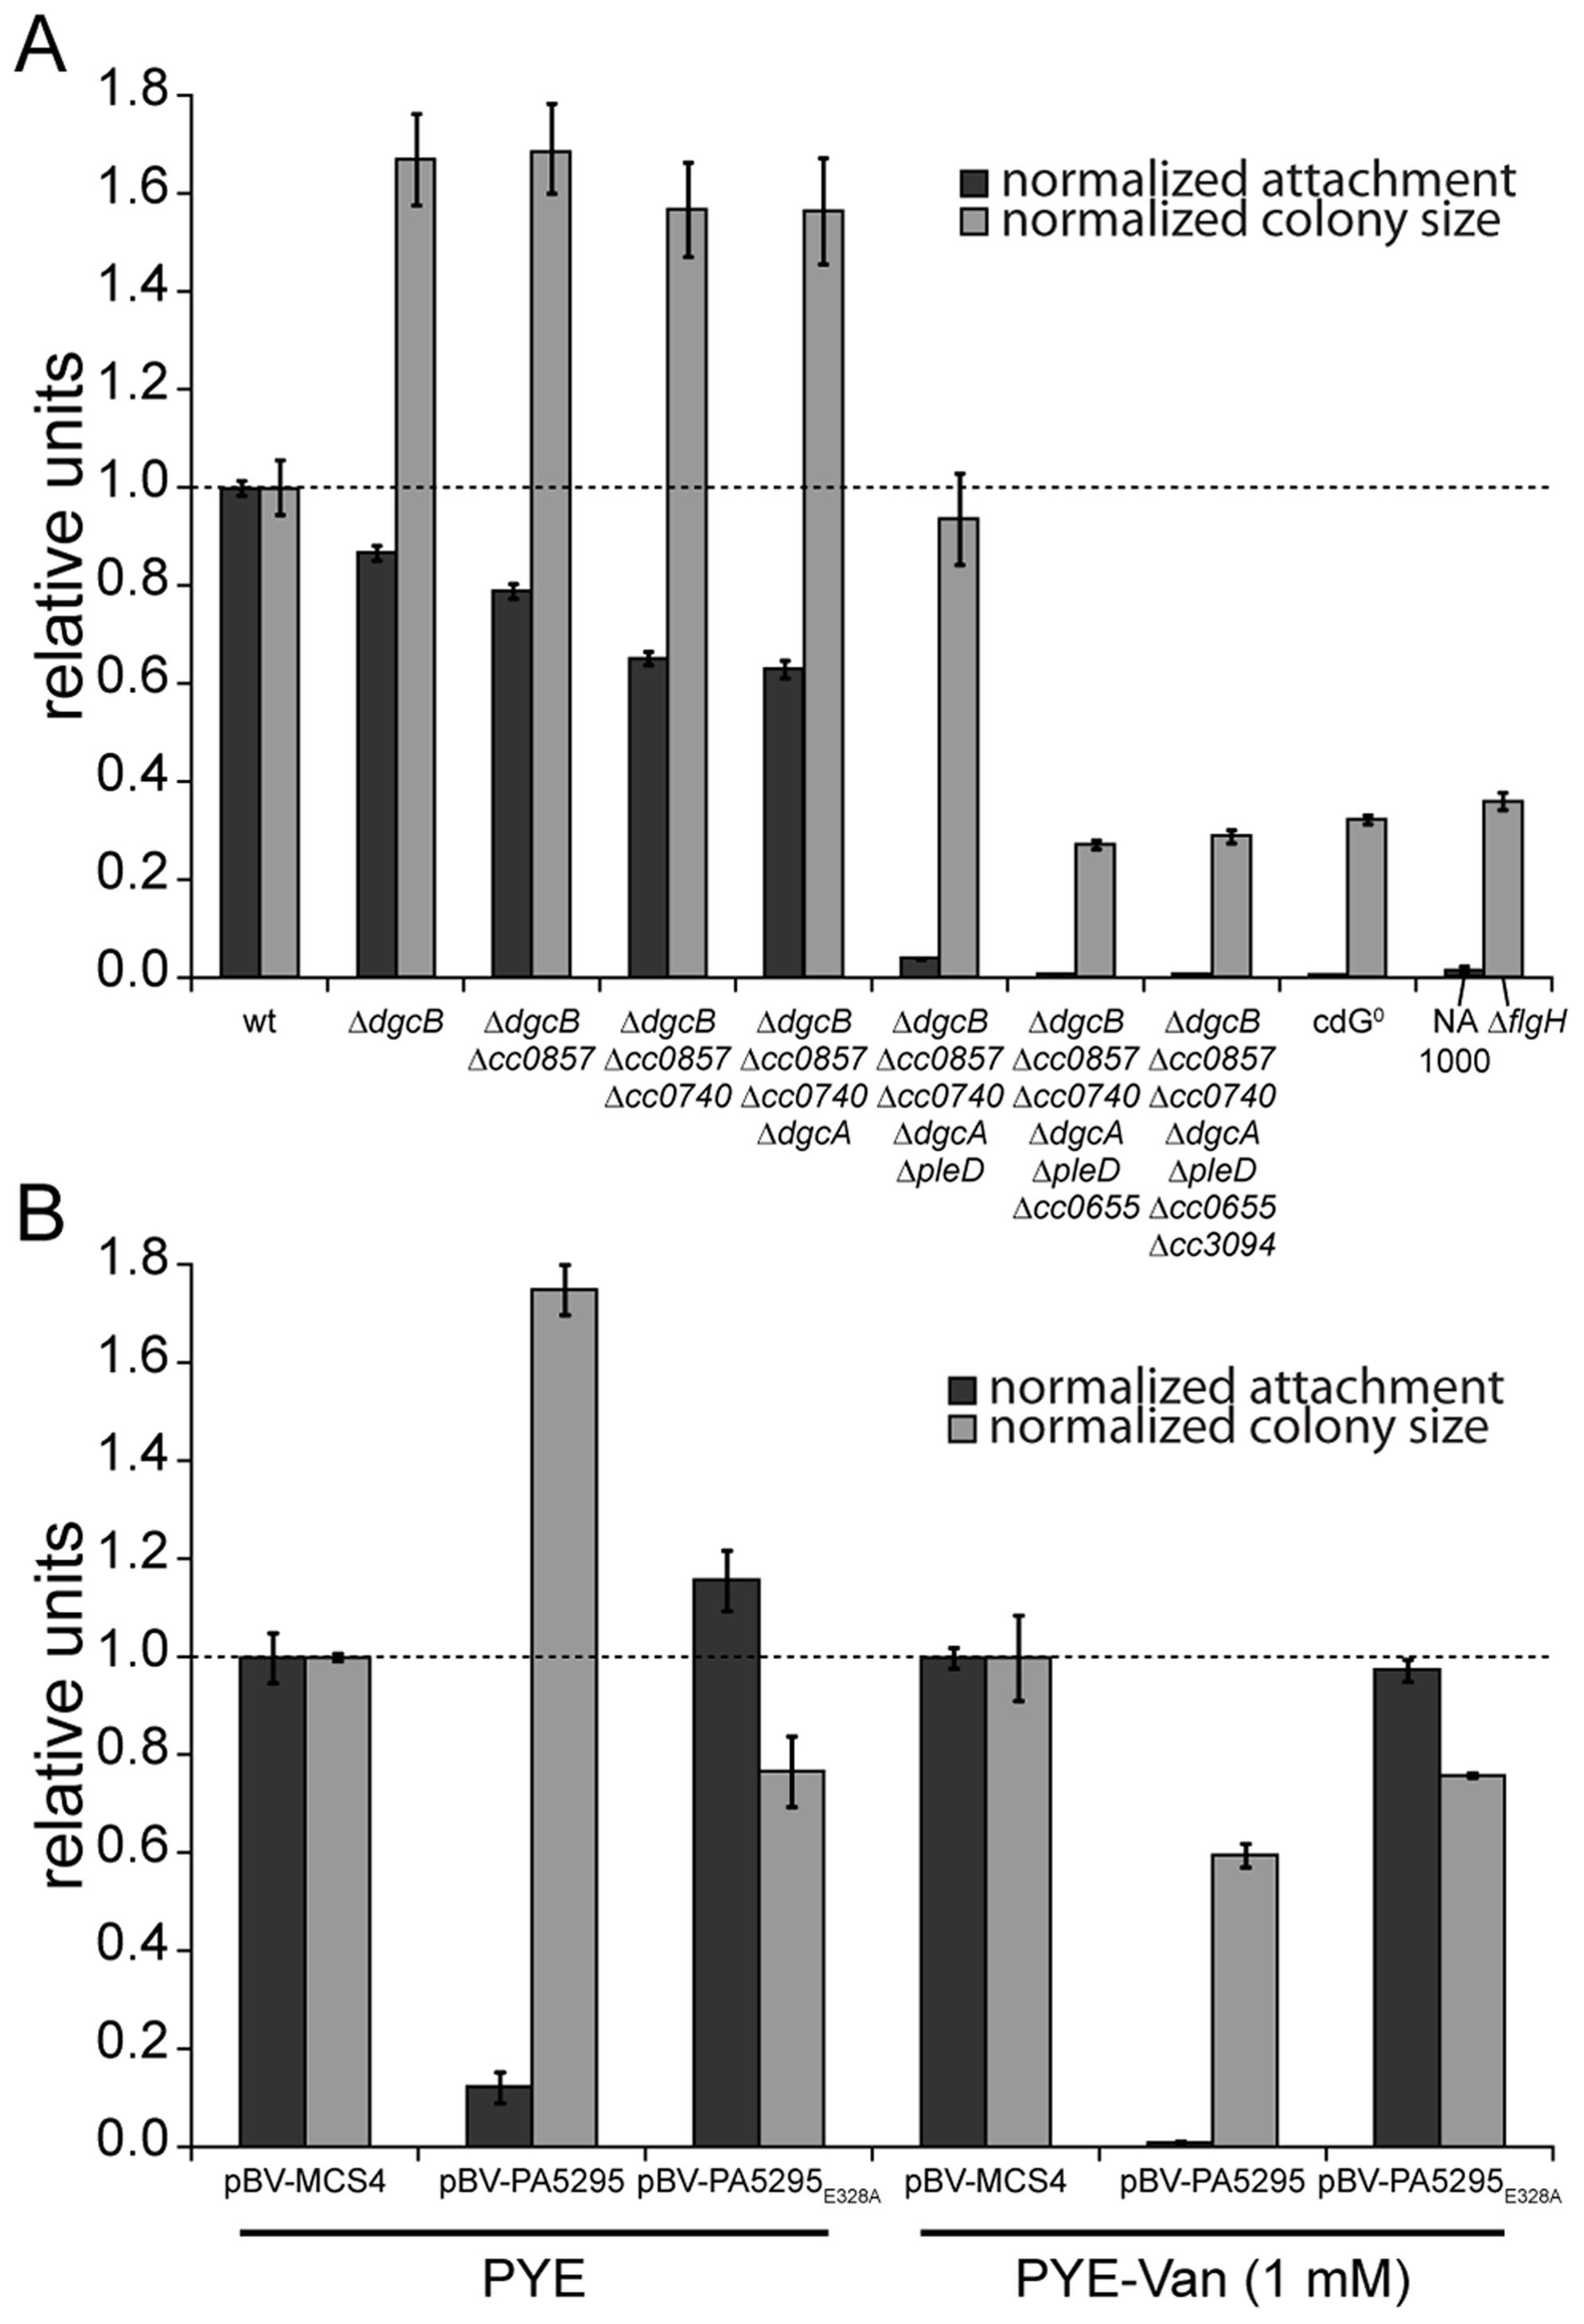 C-di-GMP is essential for motility and attachment in <i>C. crescentus</i>.